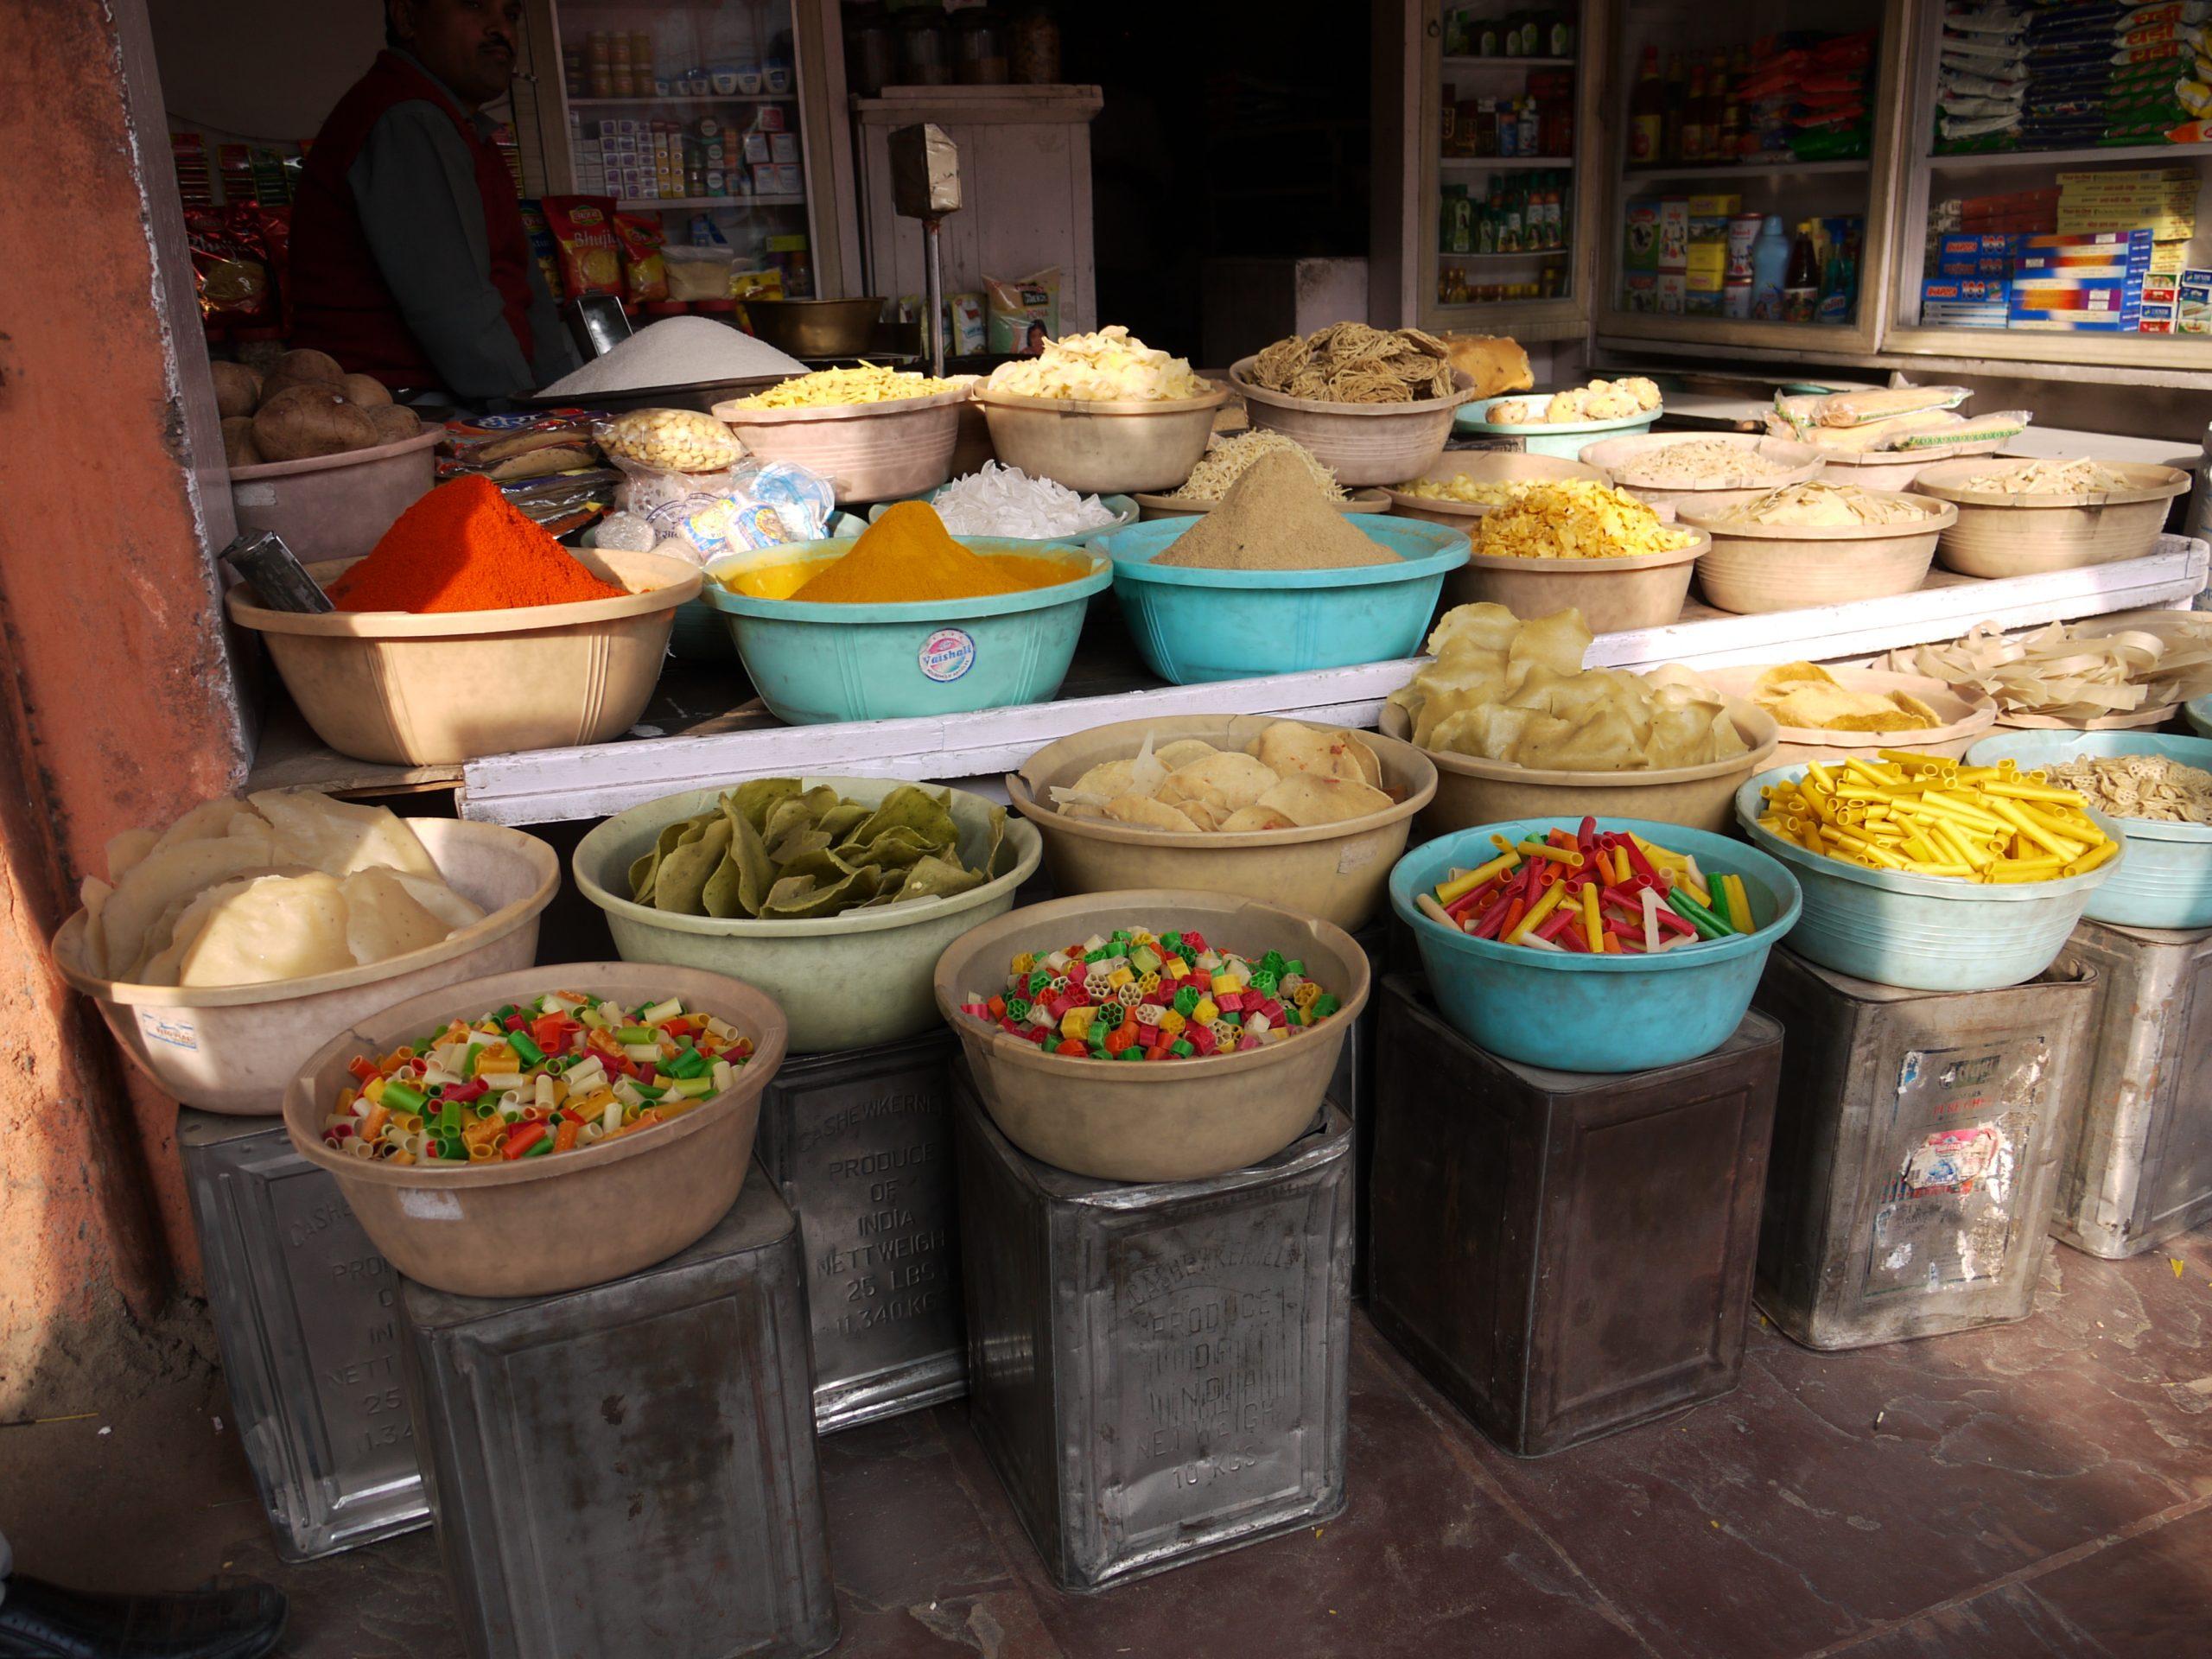 Habibganj Market-Top Spot In Bhopal For A Shopping